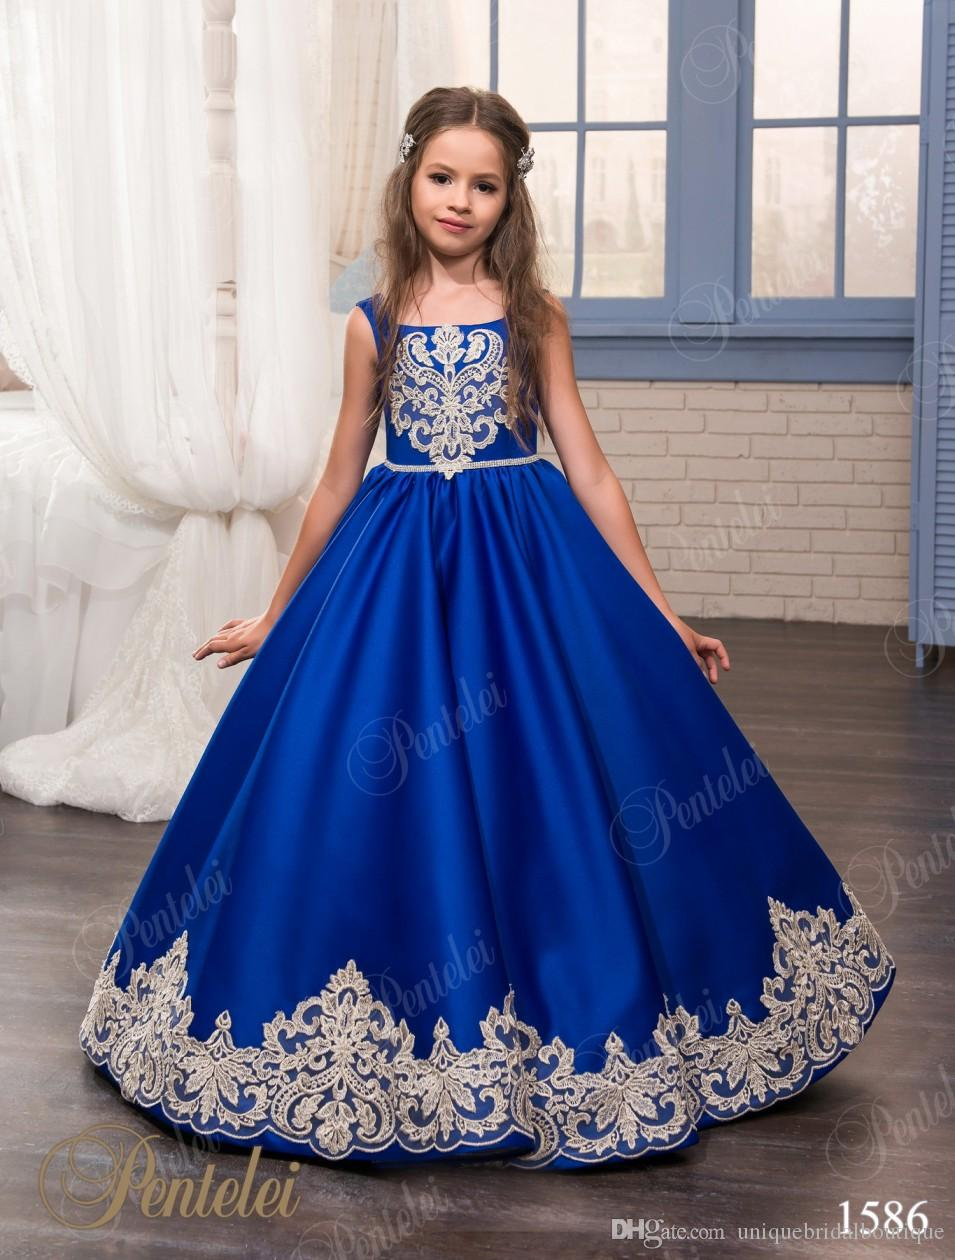 Kids Christmas Dresses For Party 2017 Royal Blue Girl Birthday ...